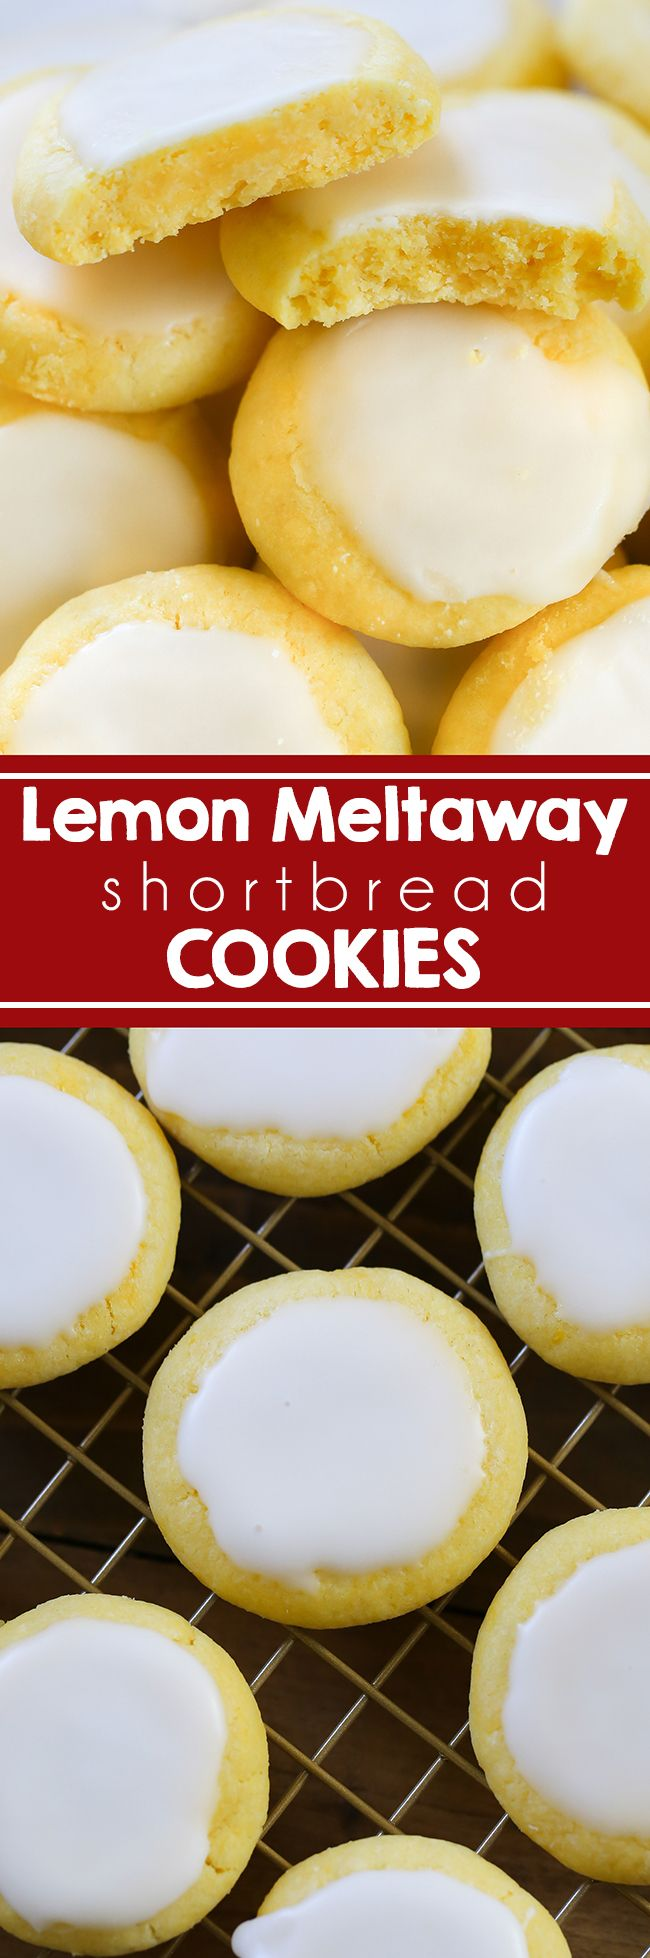 Lemon Meltaway Cookies - Quick and easy lemon meltaways. Cookie dough uses just a few ingredients including cornstarch.  Shortbread tea cookies #lemon #cookies #dessert